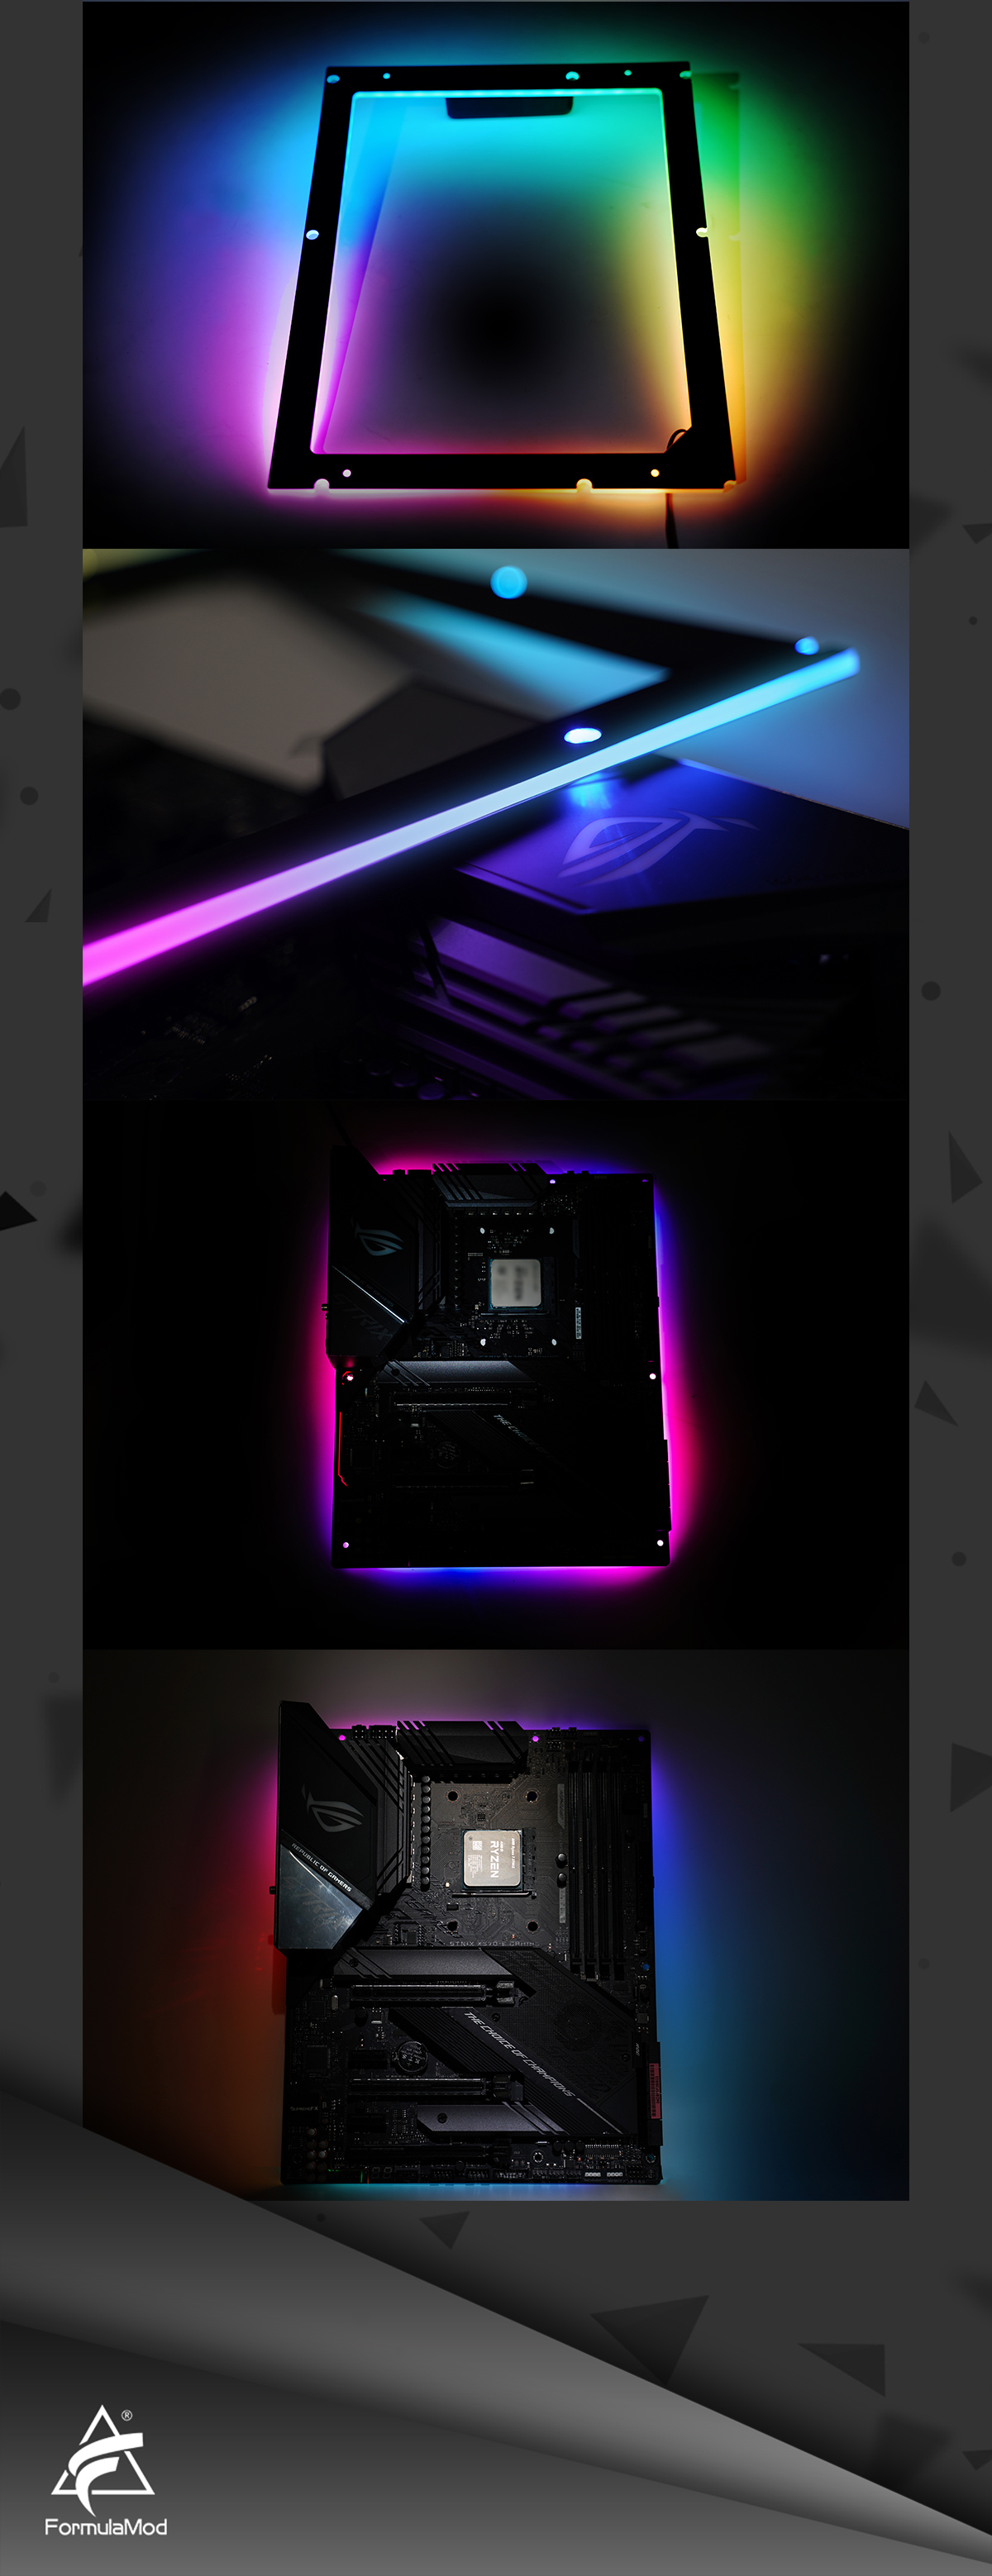 FormulaMod Lightinghouse ATX Motherboard Lighting Back Plate 5v 3Pin A-RGB LED Mobo Luminous Backplane Dekoration Fm-MBRGB